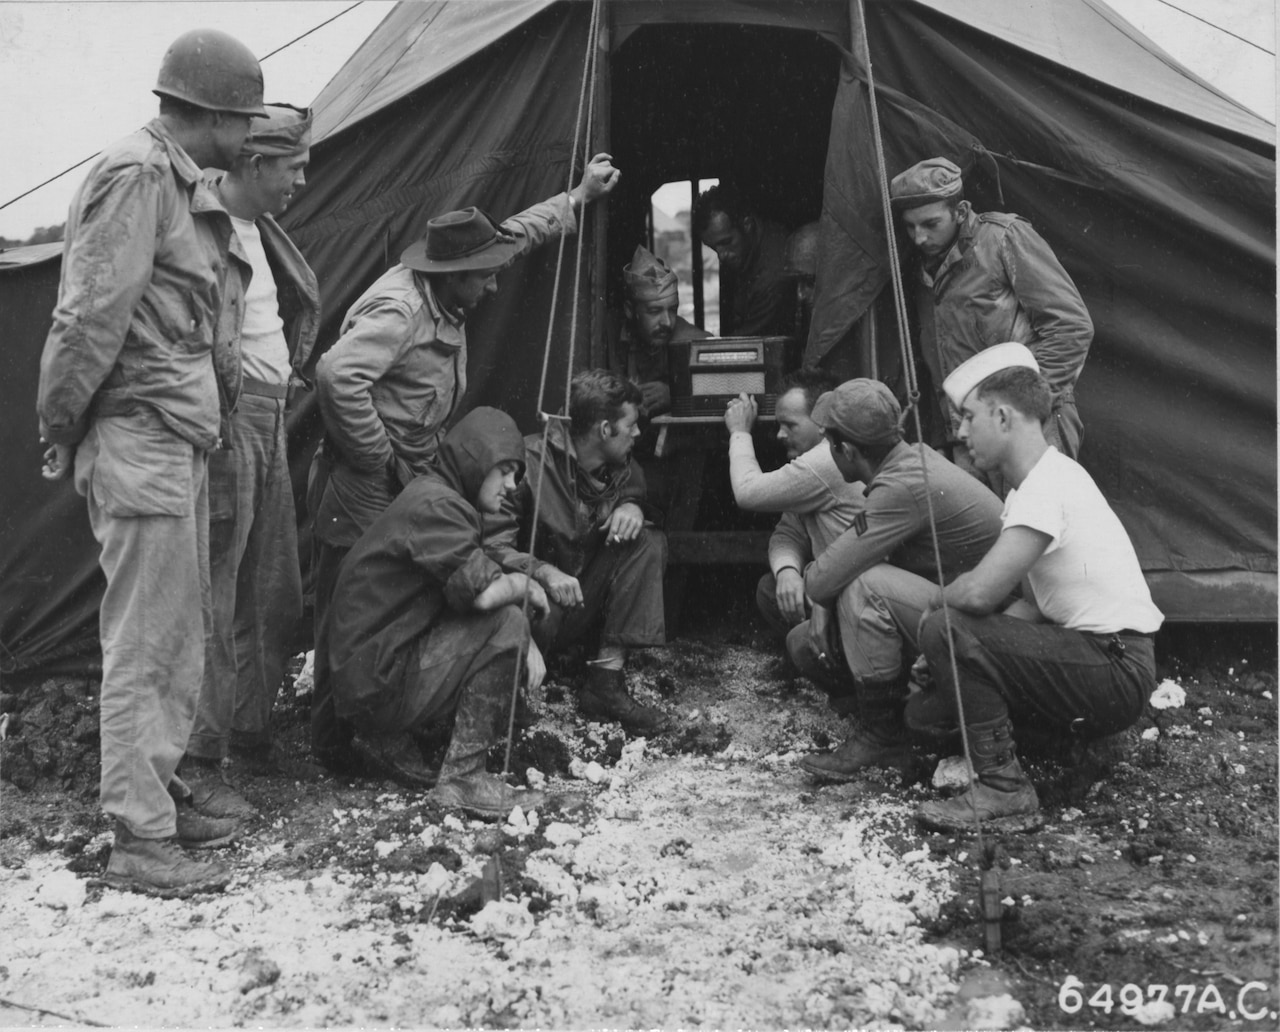 Several men crowd around a 1940s-era radio sitting just inside a tent.